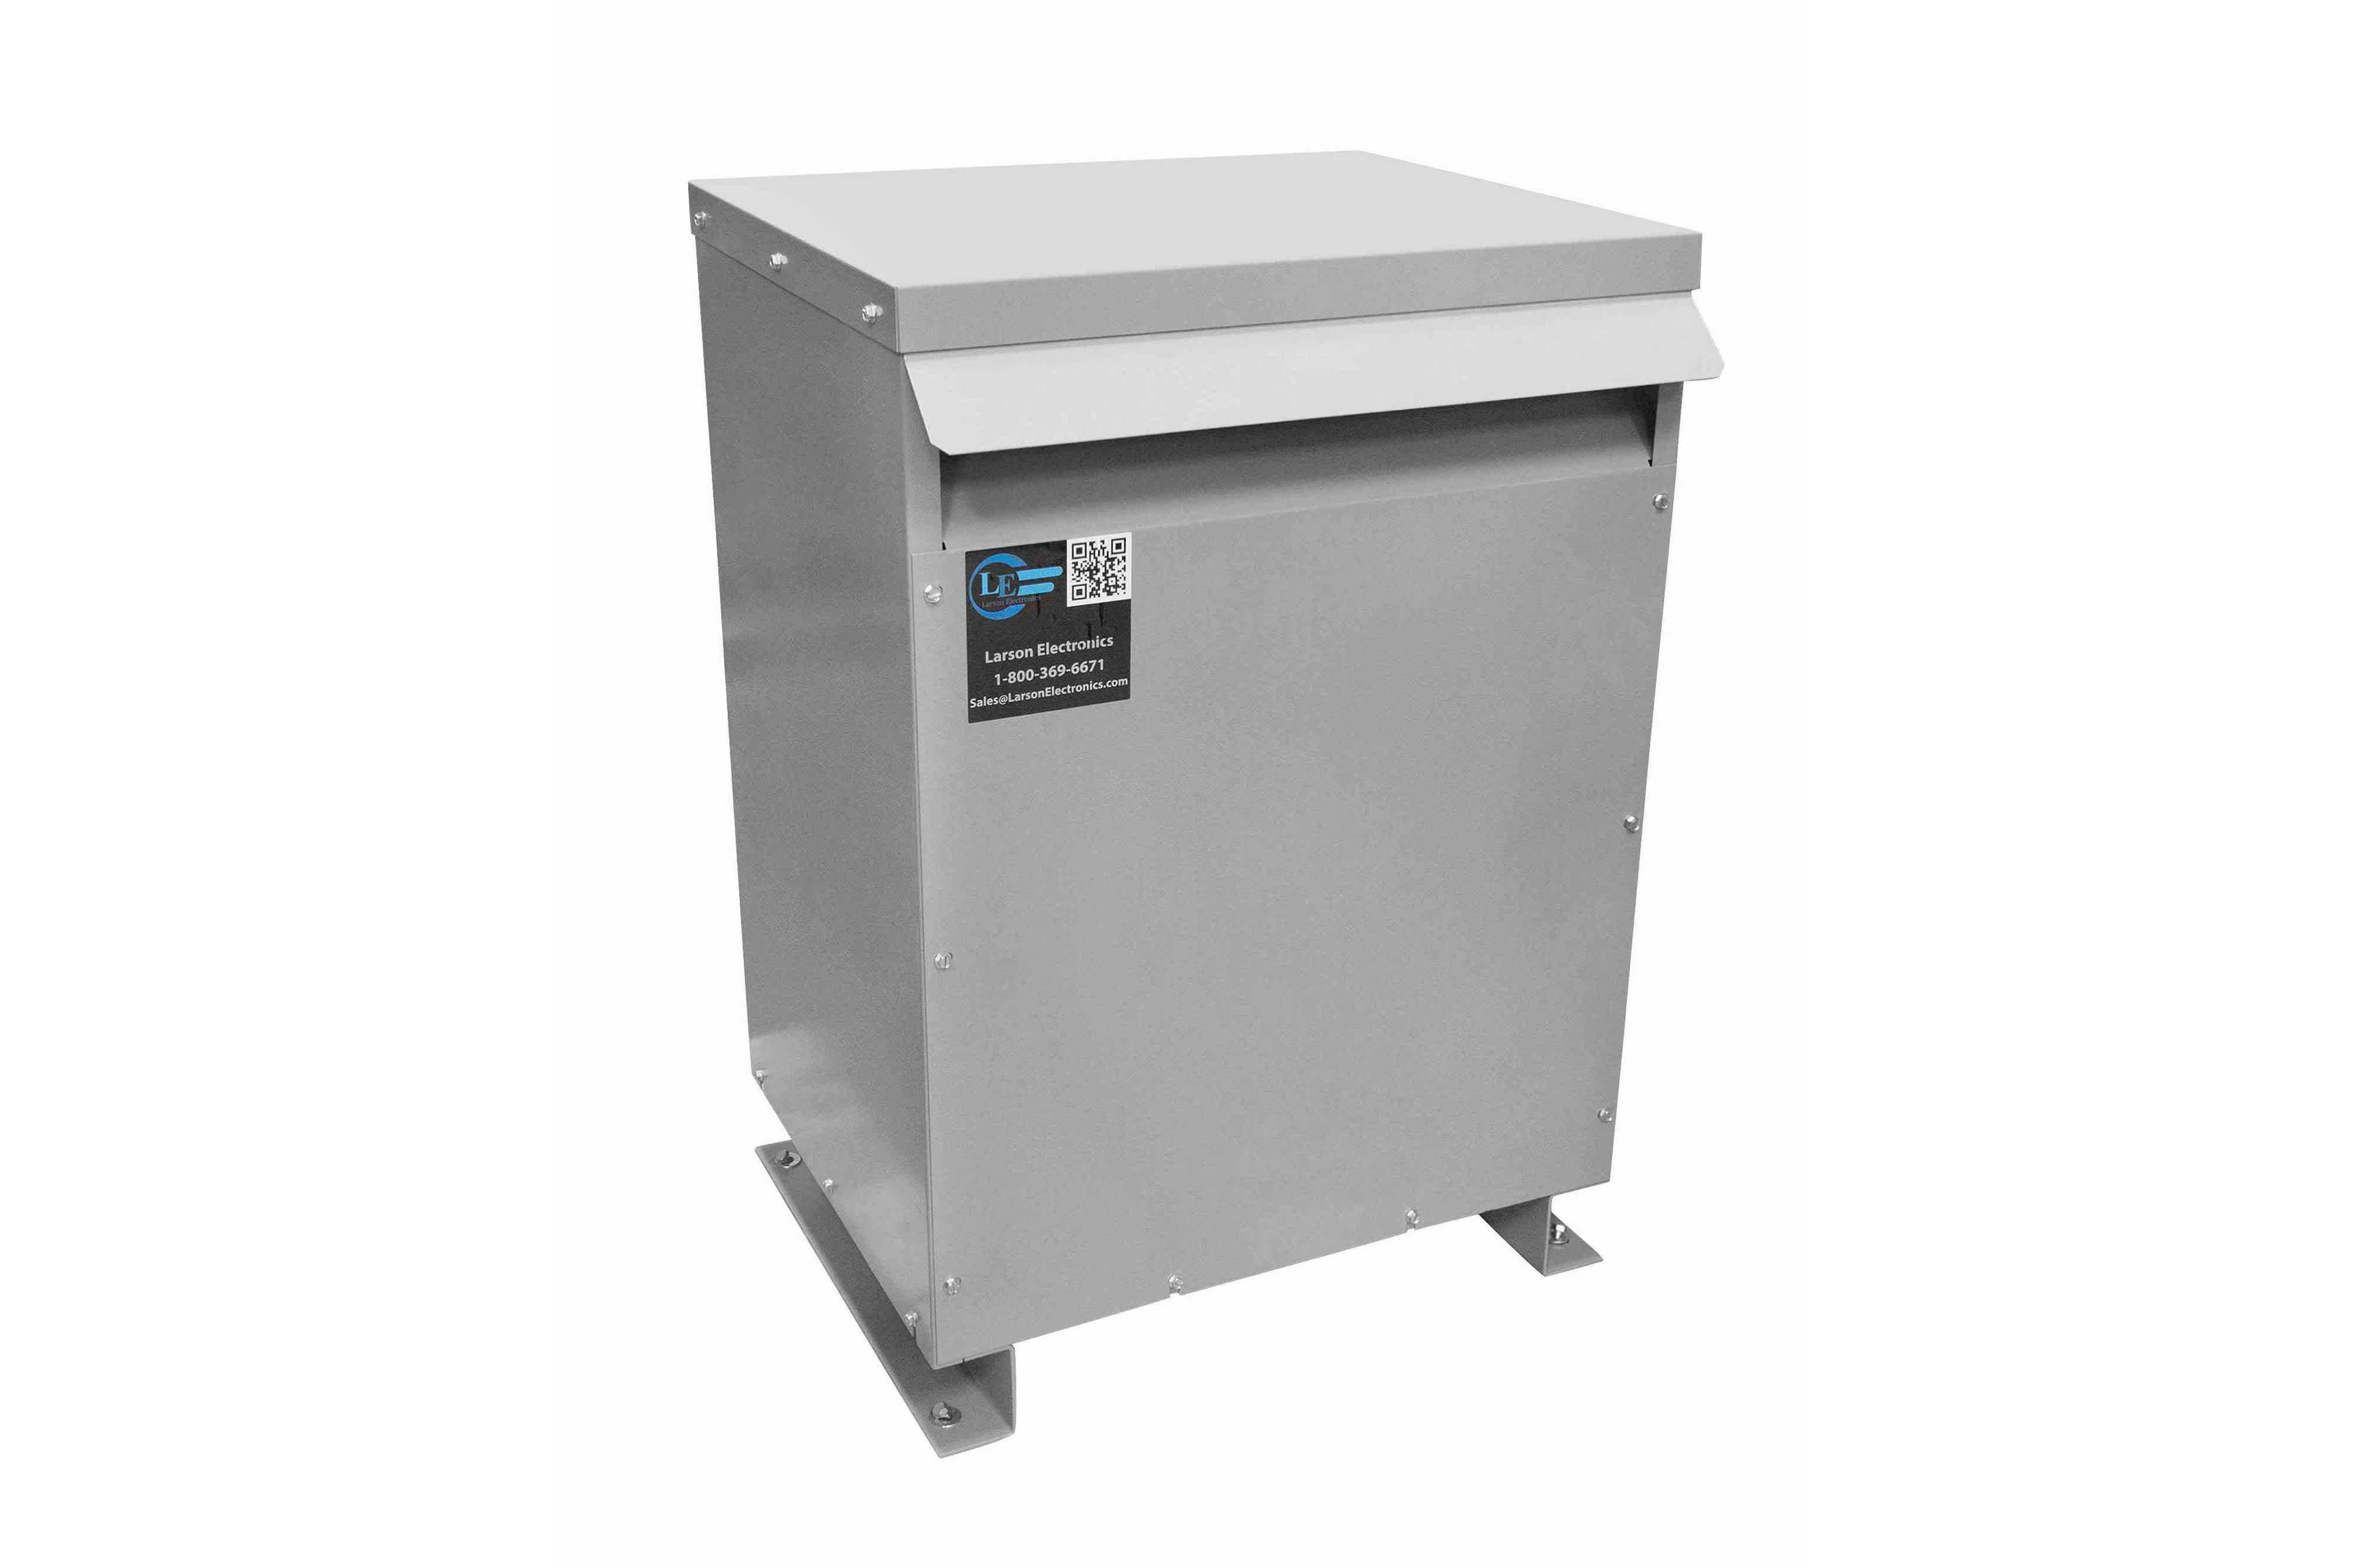 15 kVA 3PH Isolation Transformer, 380V Wye Primary, 208Y/120 Wye-N Secondary, N3R, Ventilated, 60 Hz